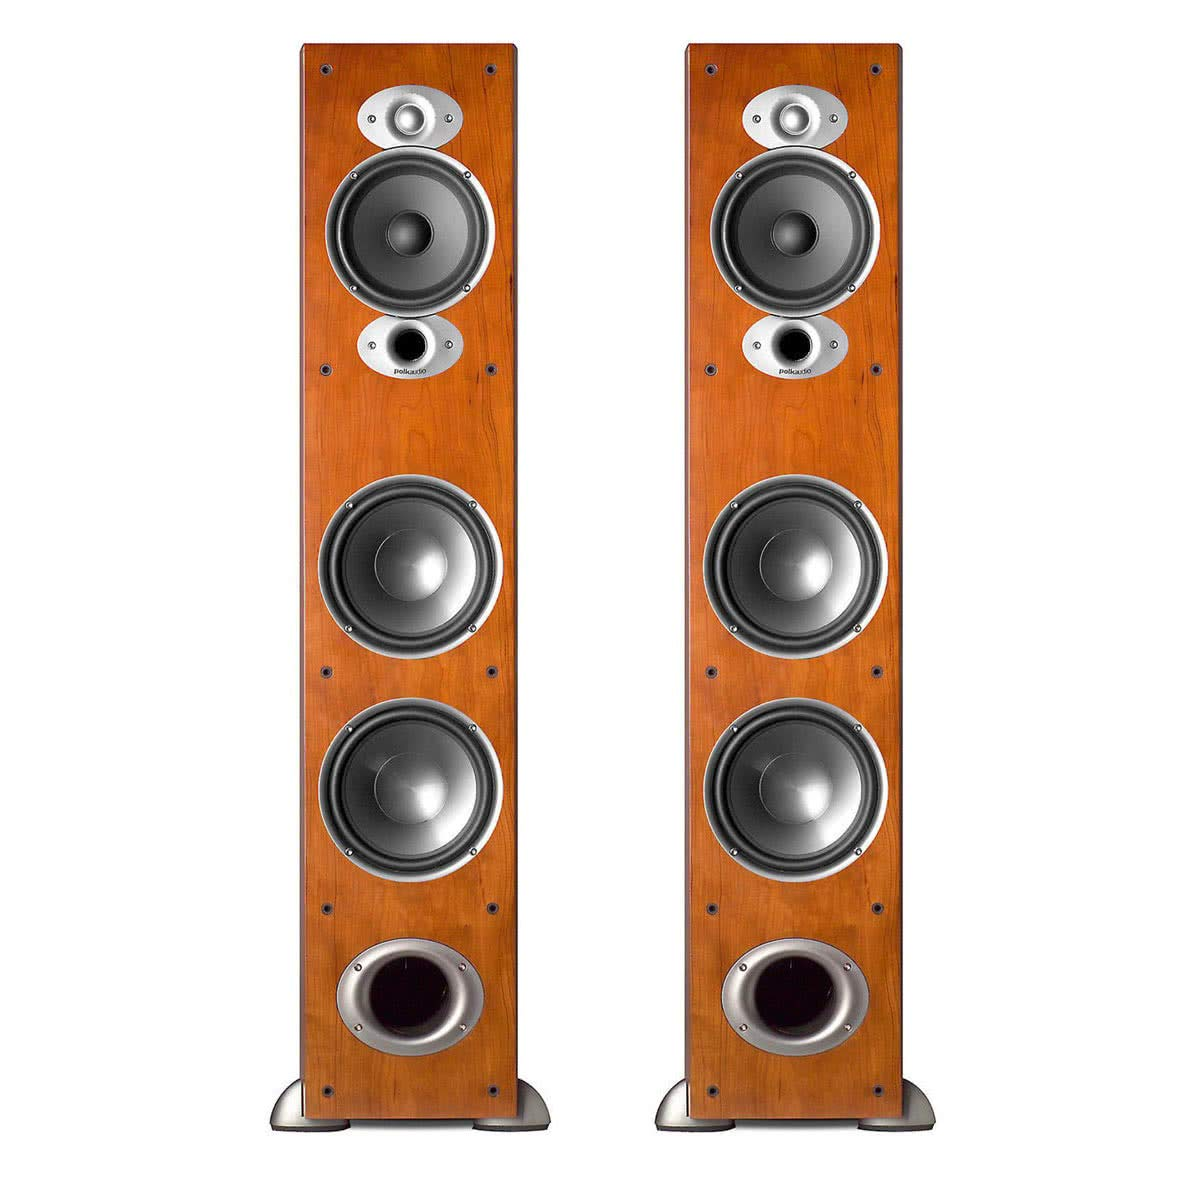 Polk Audio RTiA7 High Performance Floorstanding Loudspeakers - Pair (Cherry) by Polk Audio